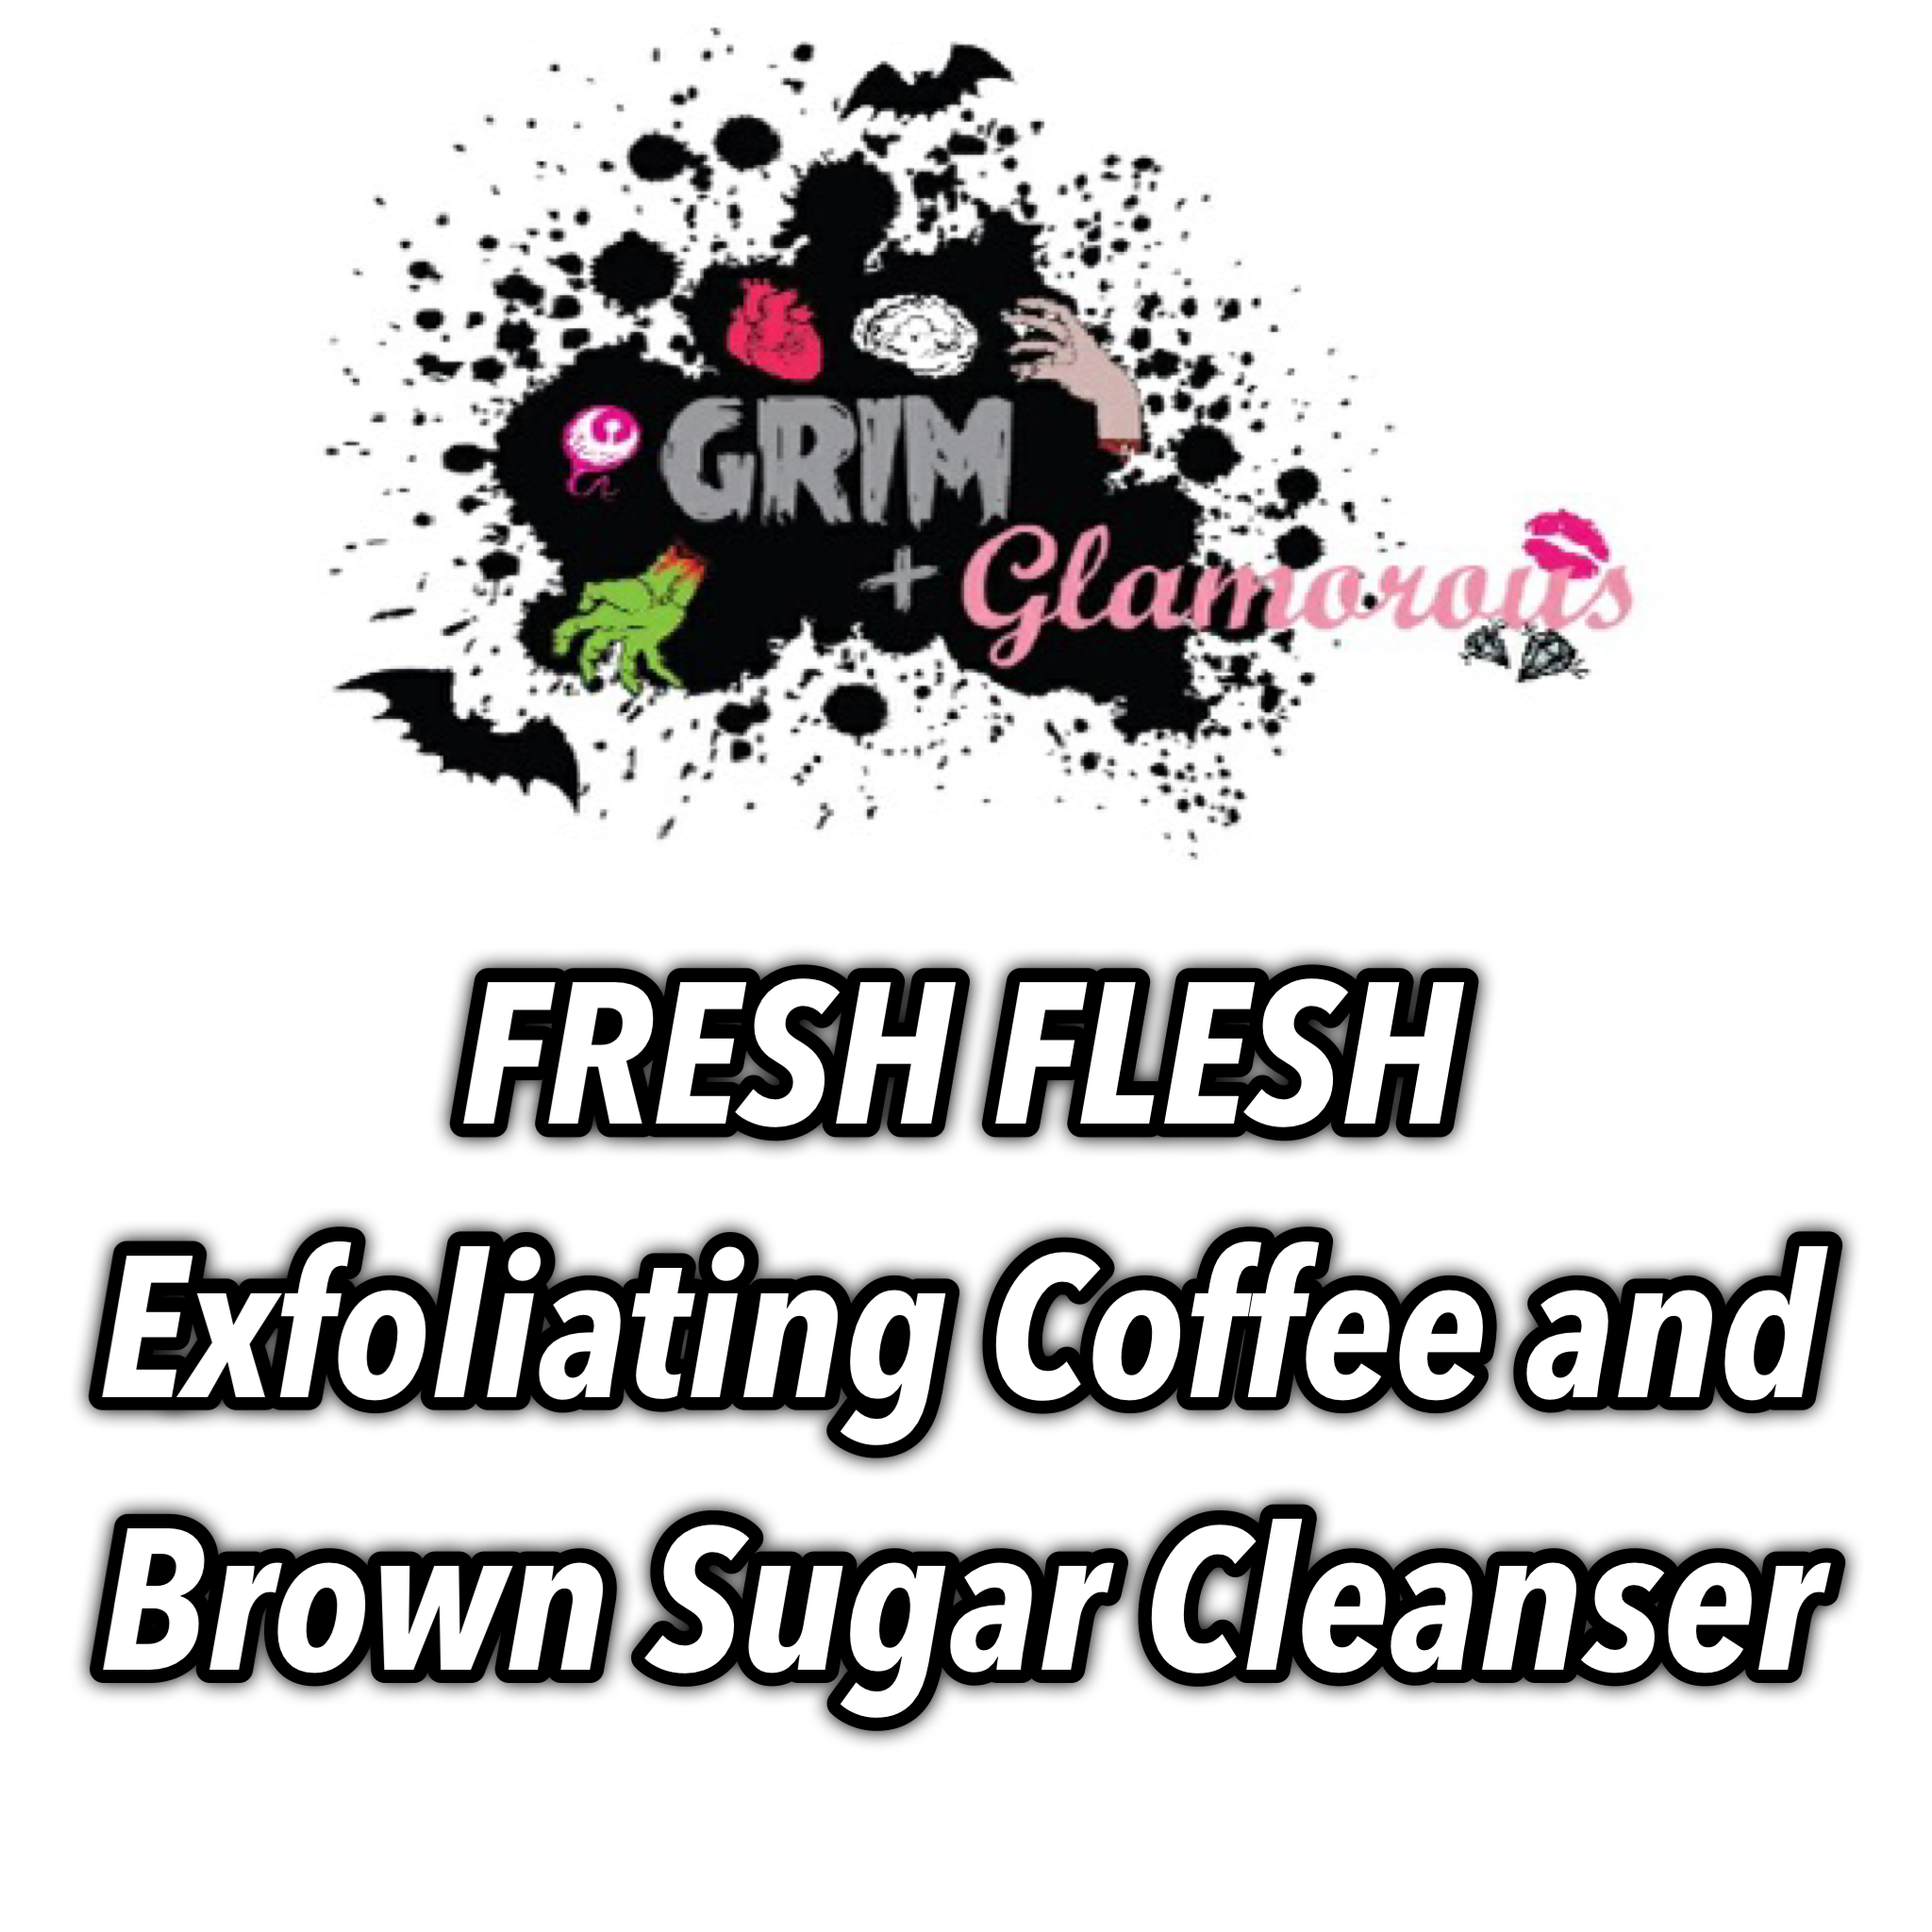 Fresh Flesh Exfoliating Coffee And Brown Sugar Cleanser (cream Soap-cream Body Wash-sugar Scrub-coffee Scrub-olive/almond/vit E Oil Soap)